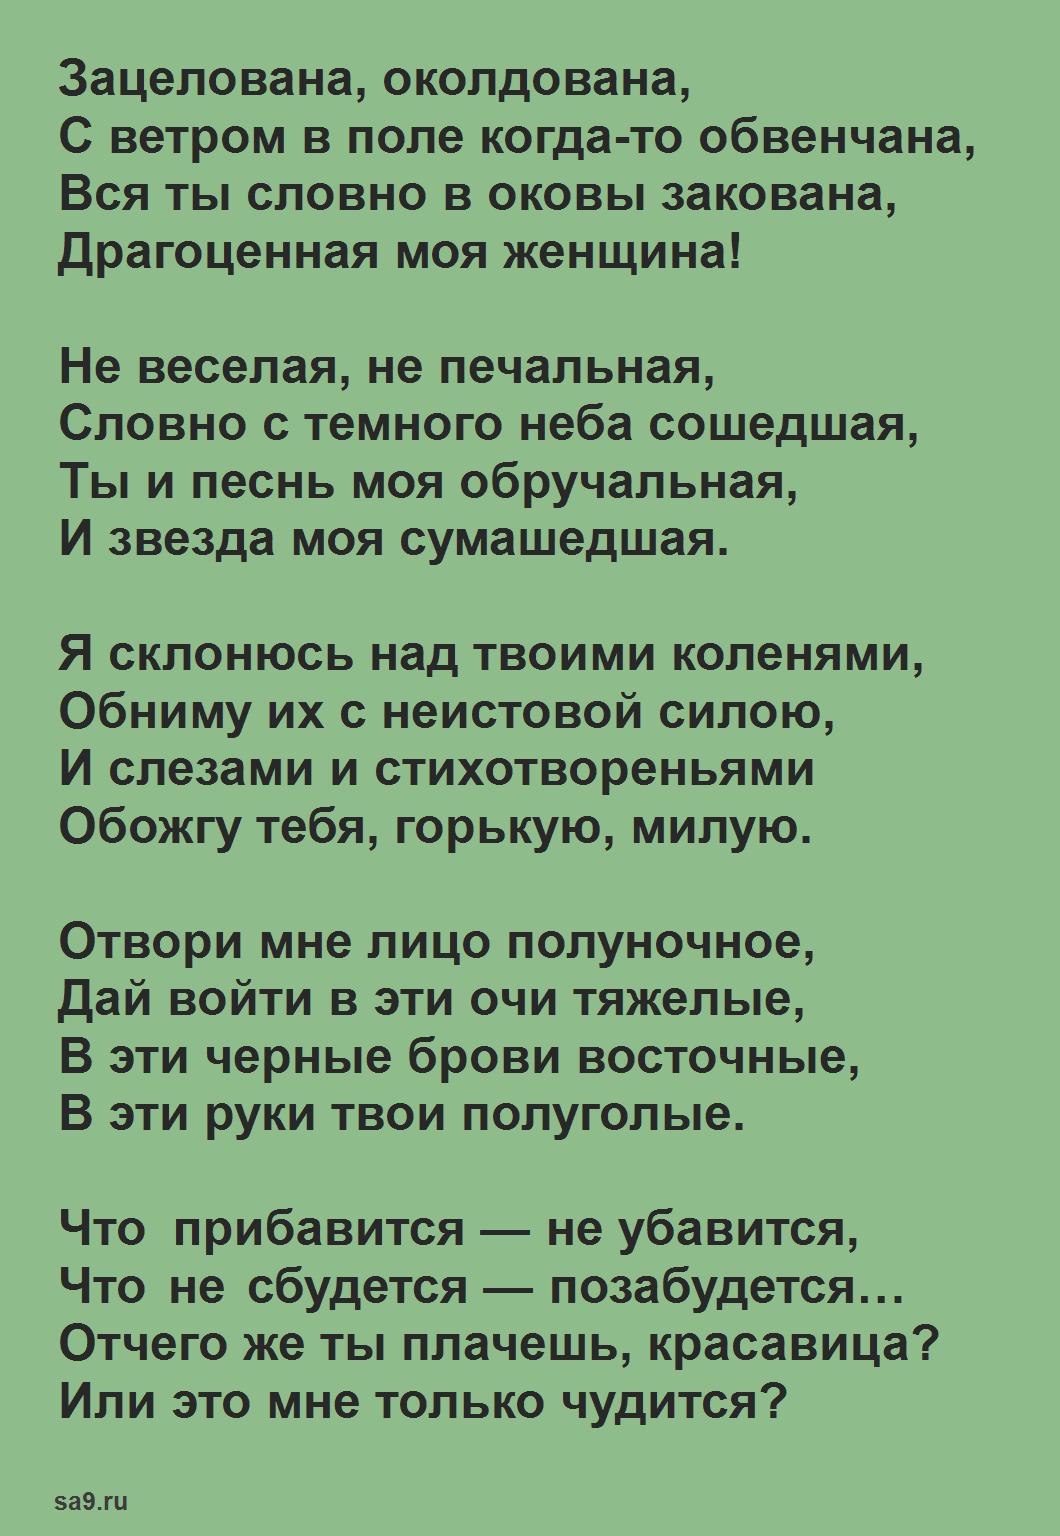 Песни на стихи Заболоцкого - Признание